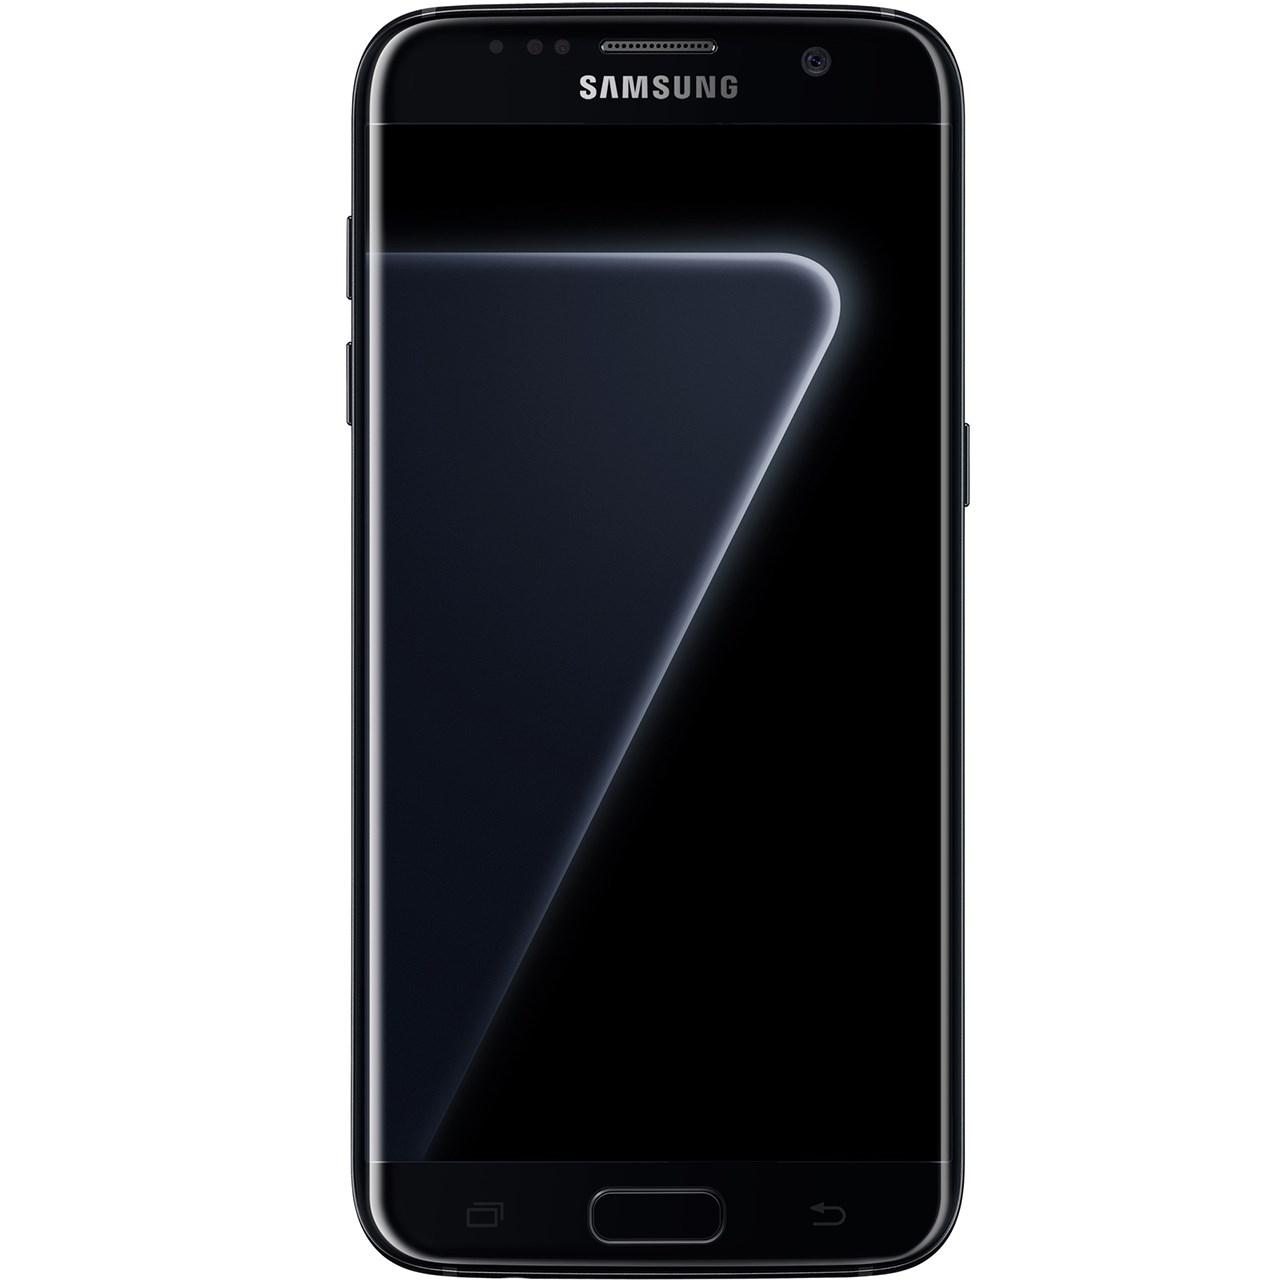 گوشي موبايل سامسونگ مدل Galaxy S7 Edge SM-G935FD دو سيمکارت ظرفيت 128 گيگابايت